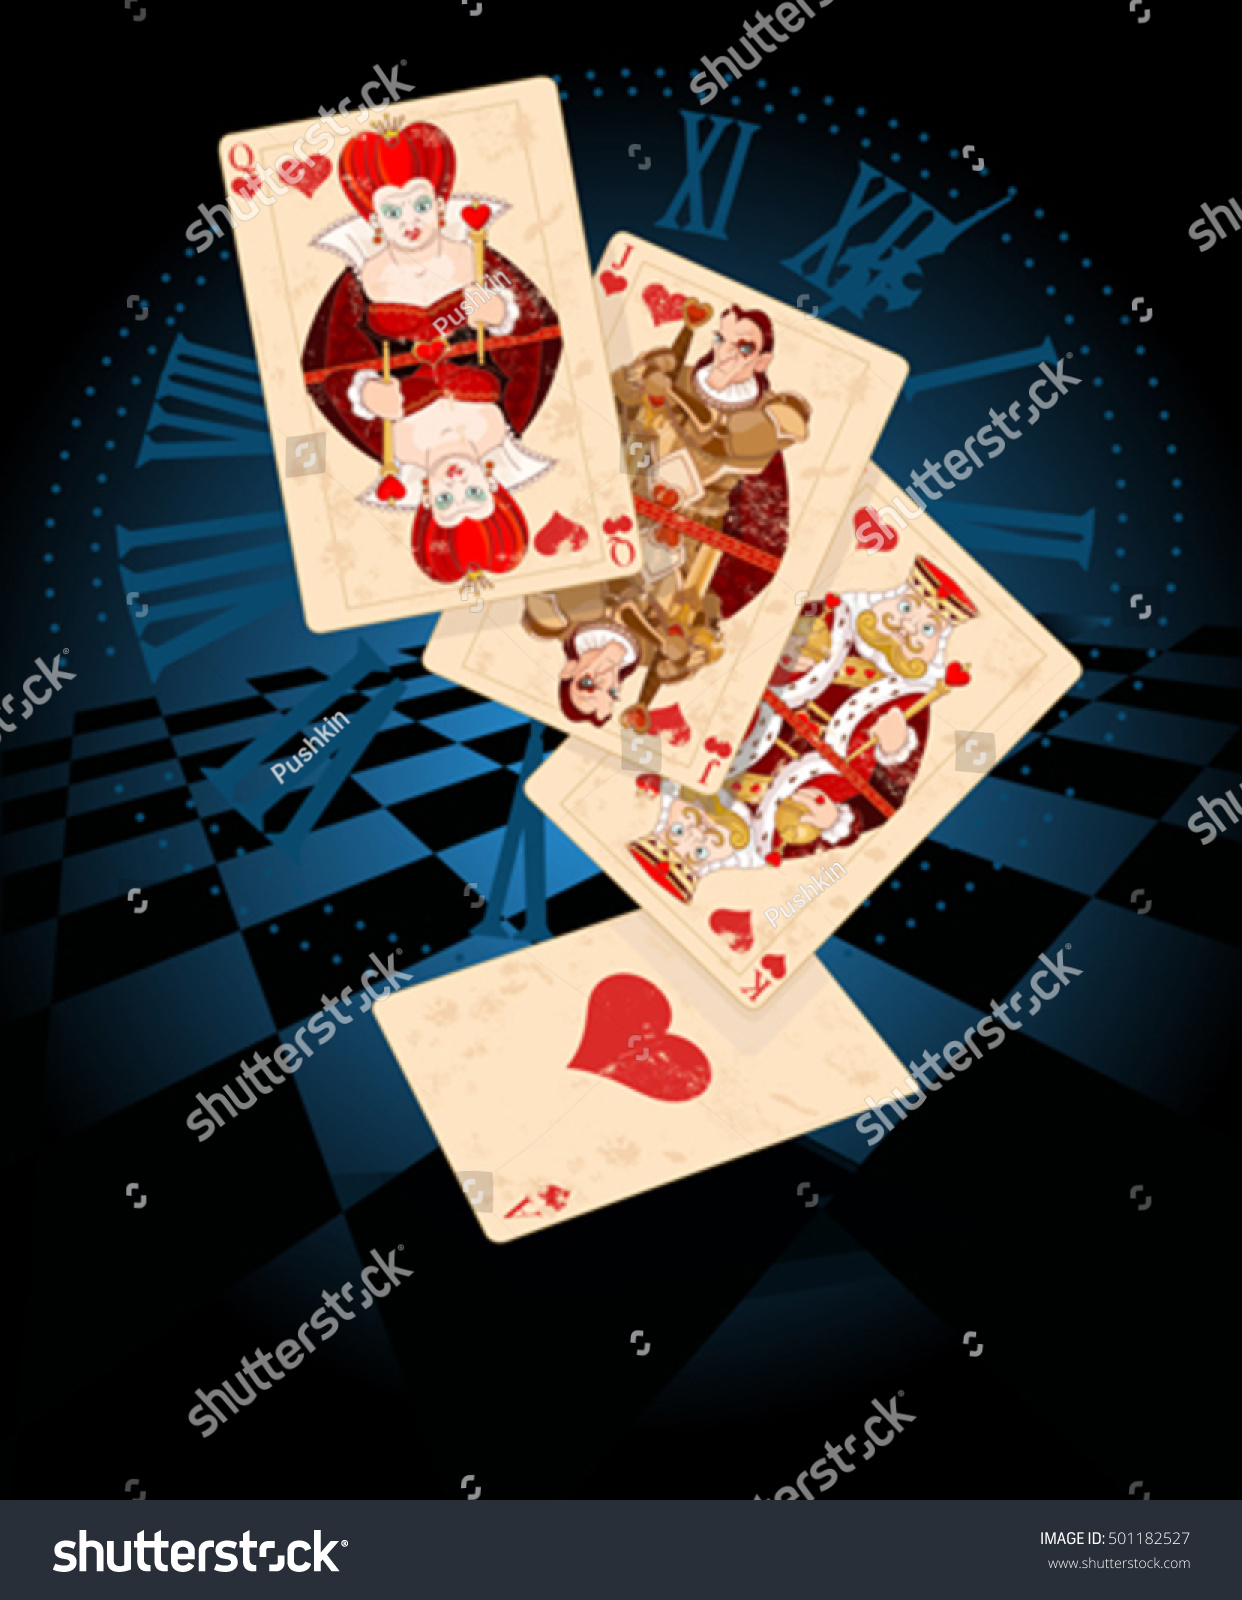 svenska online casino casino book